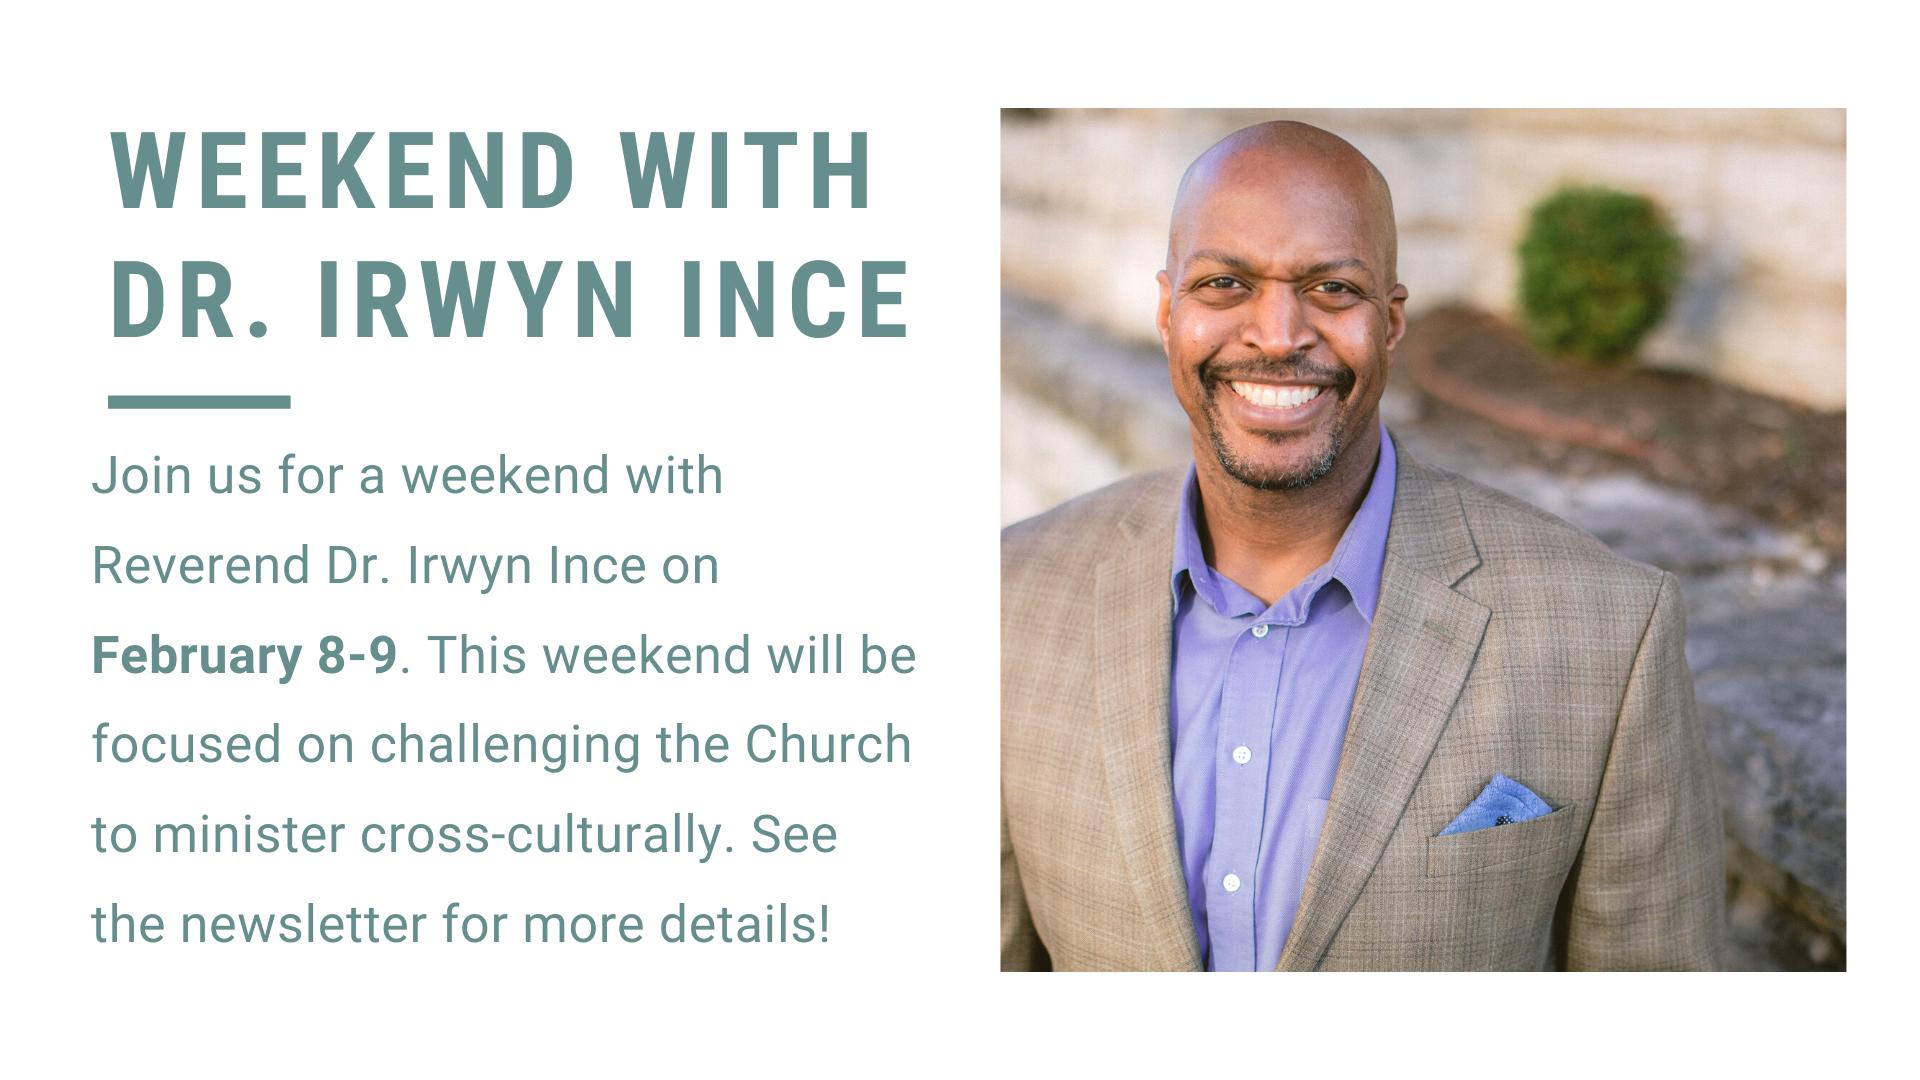 Irwyn Ince